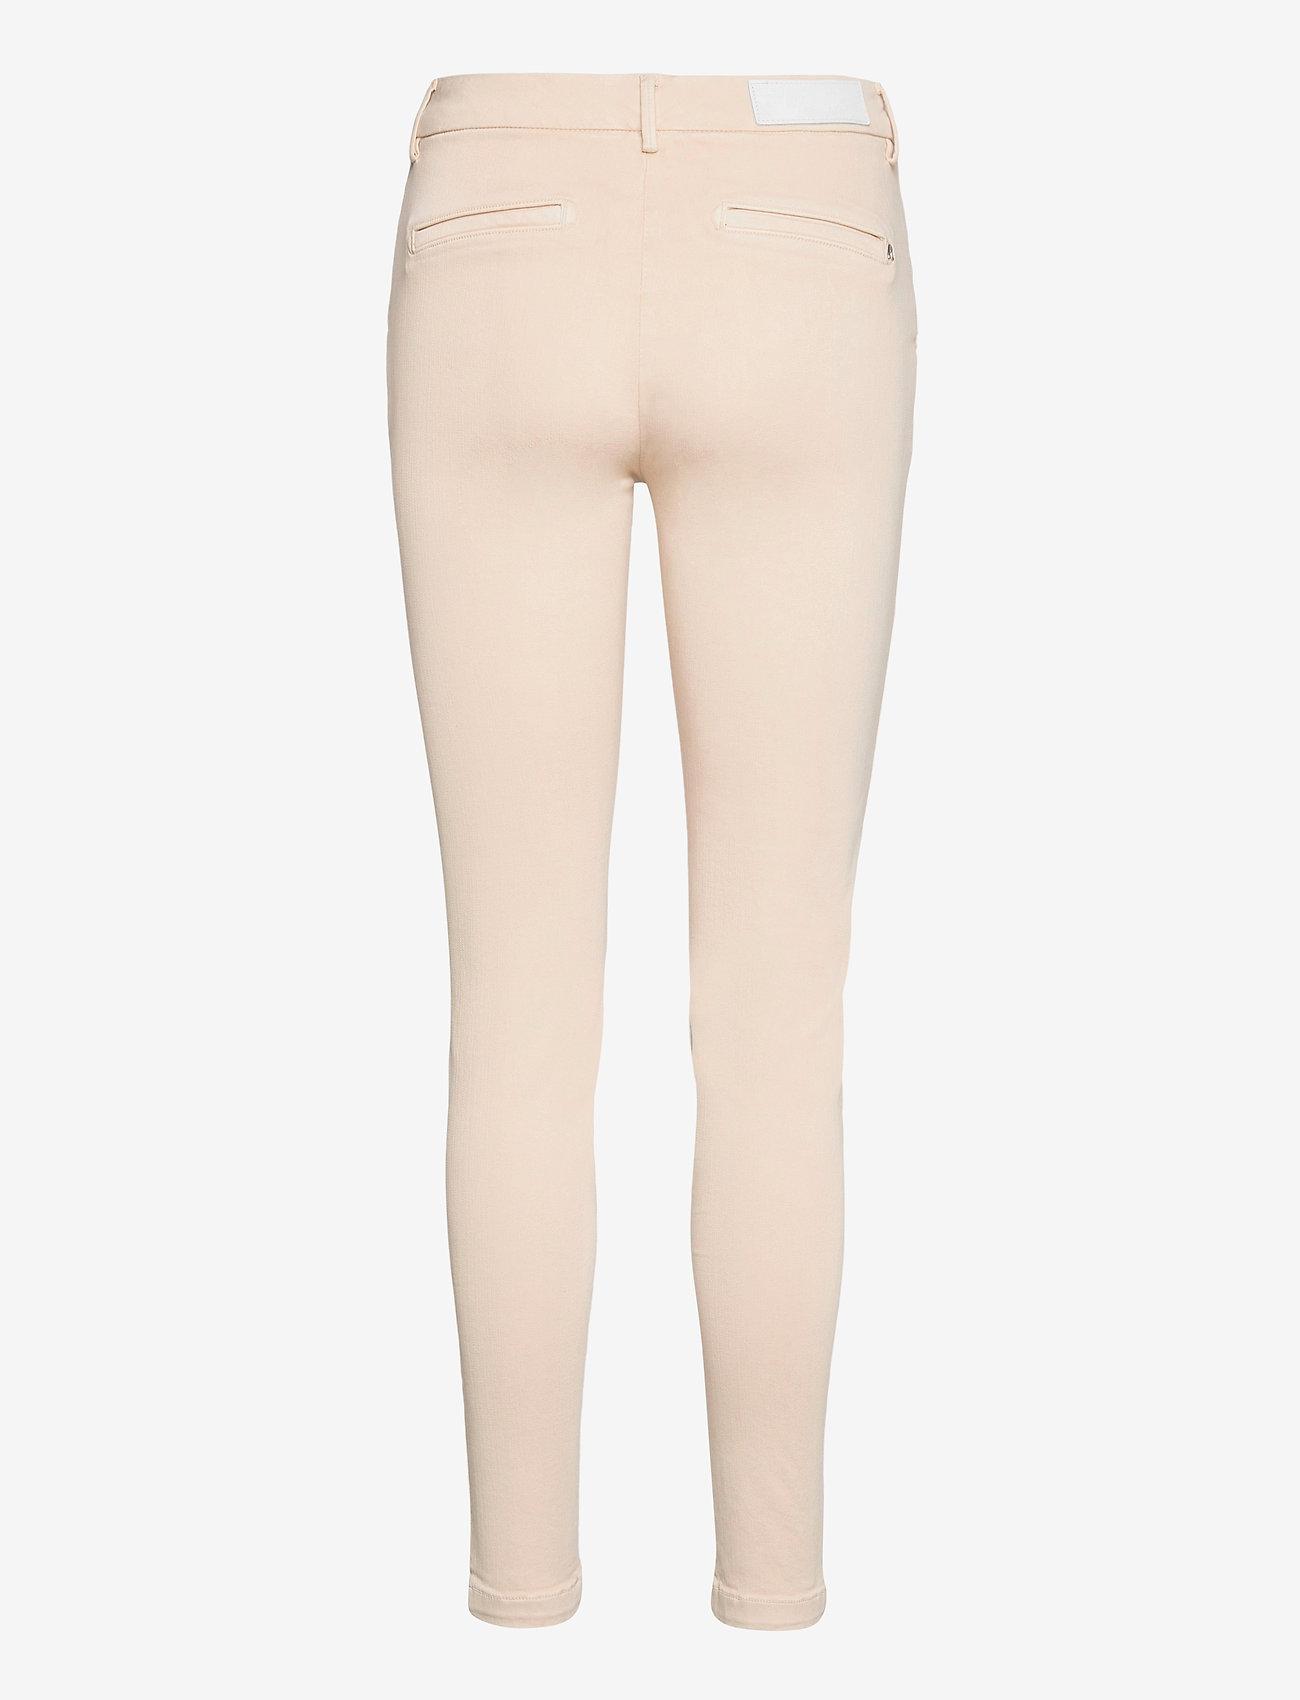 Replay - LYSA HYPERFLEX - slim jeans - cream - 1